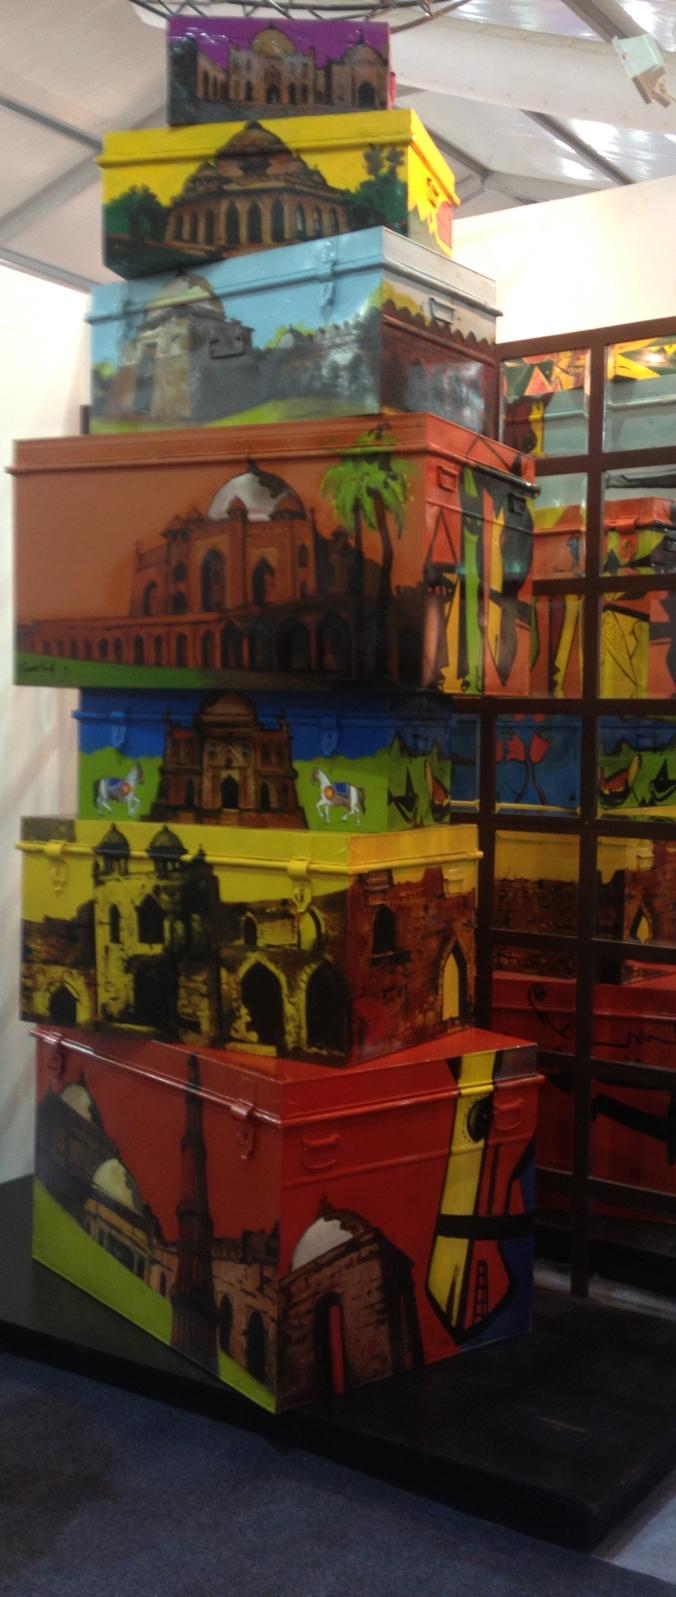 Paresh Maity's 'Delhi 7' did not inspire